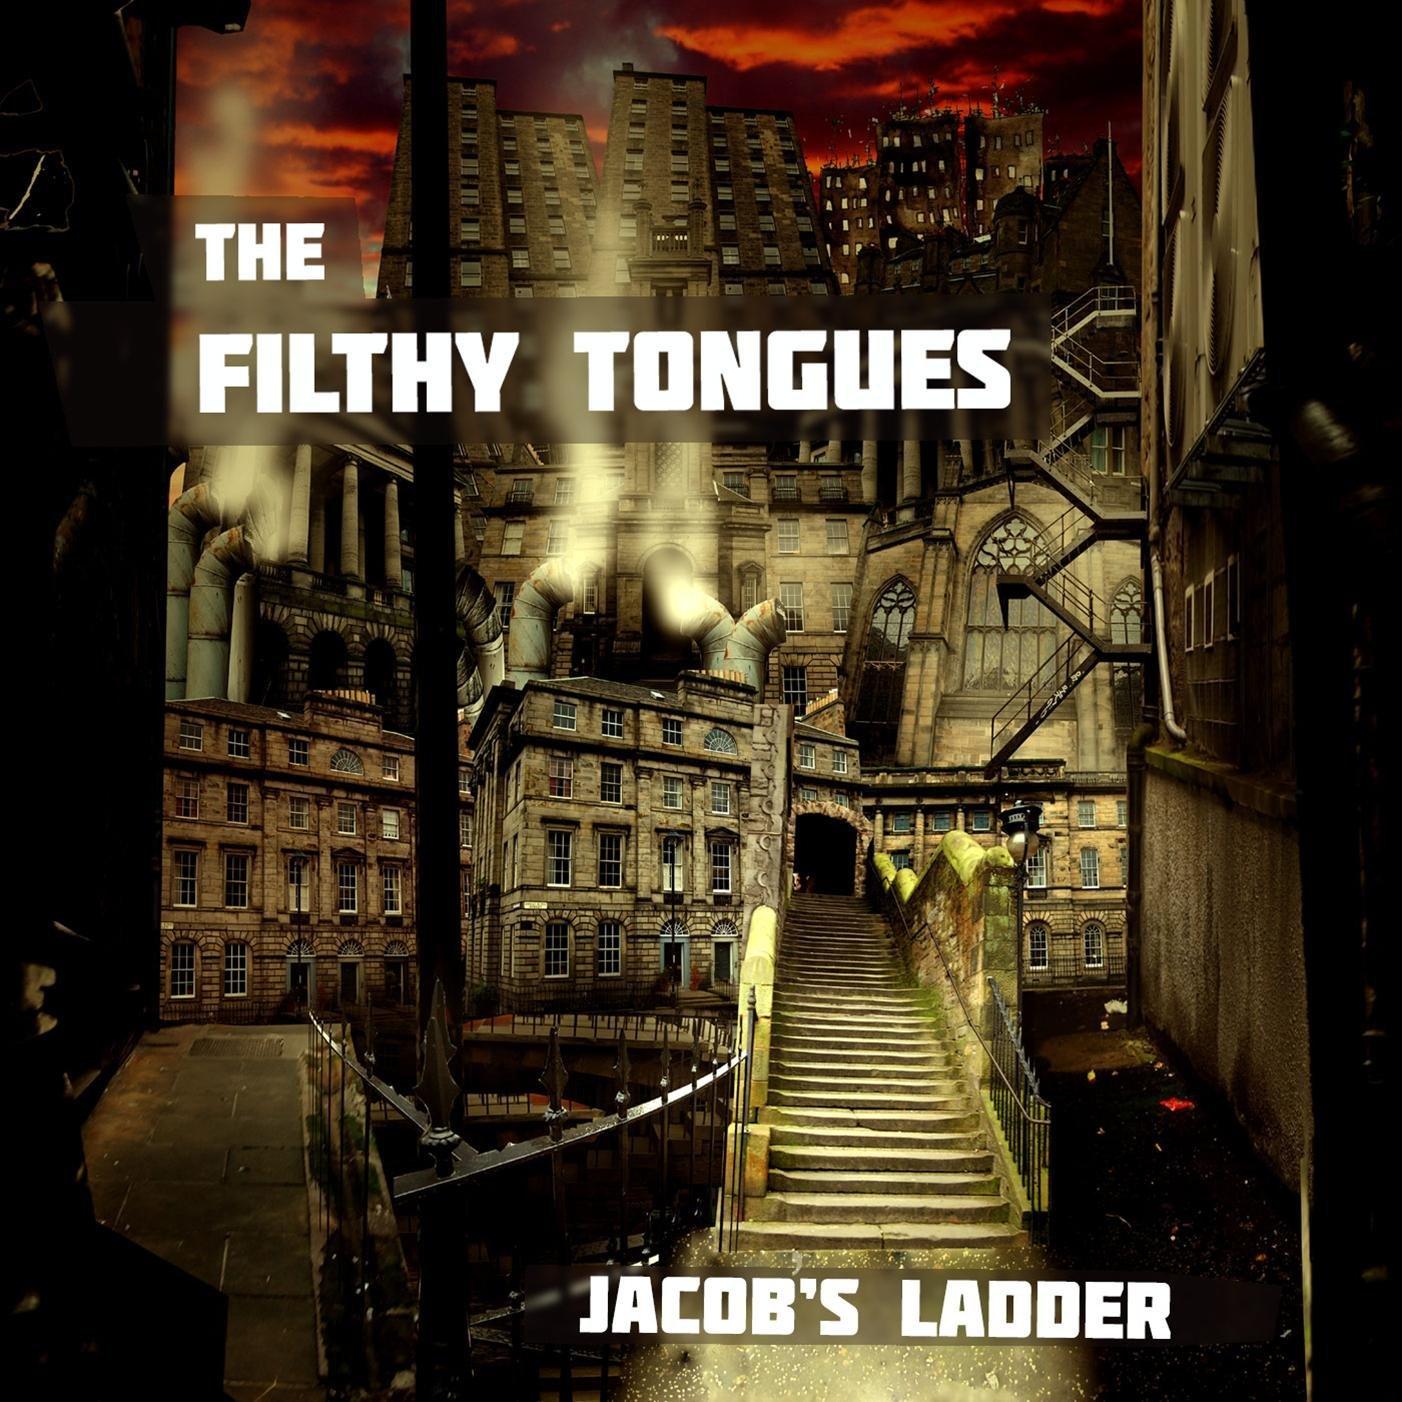 The Filthy Tongues – Jacob's Ladder (Neon Tetra / Blokshok)